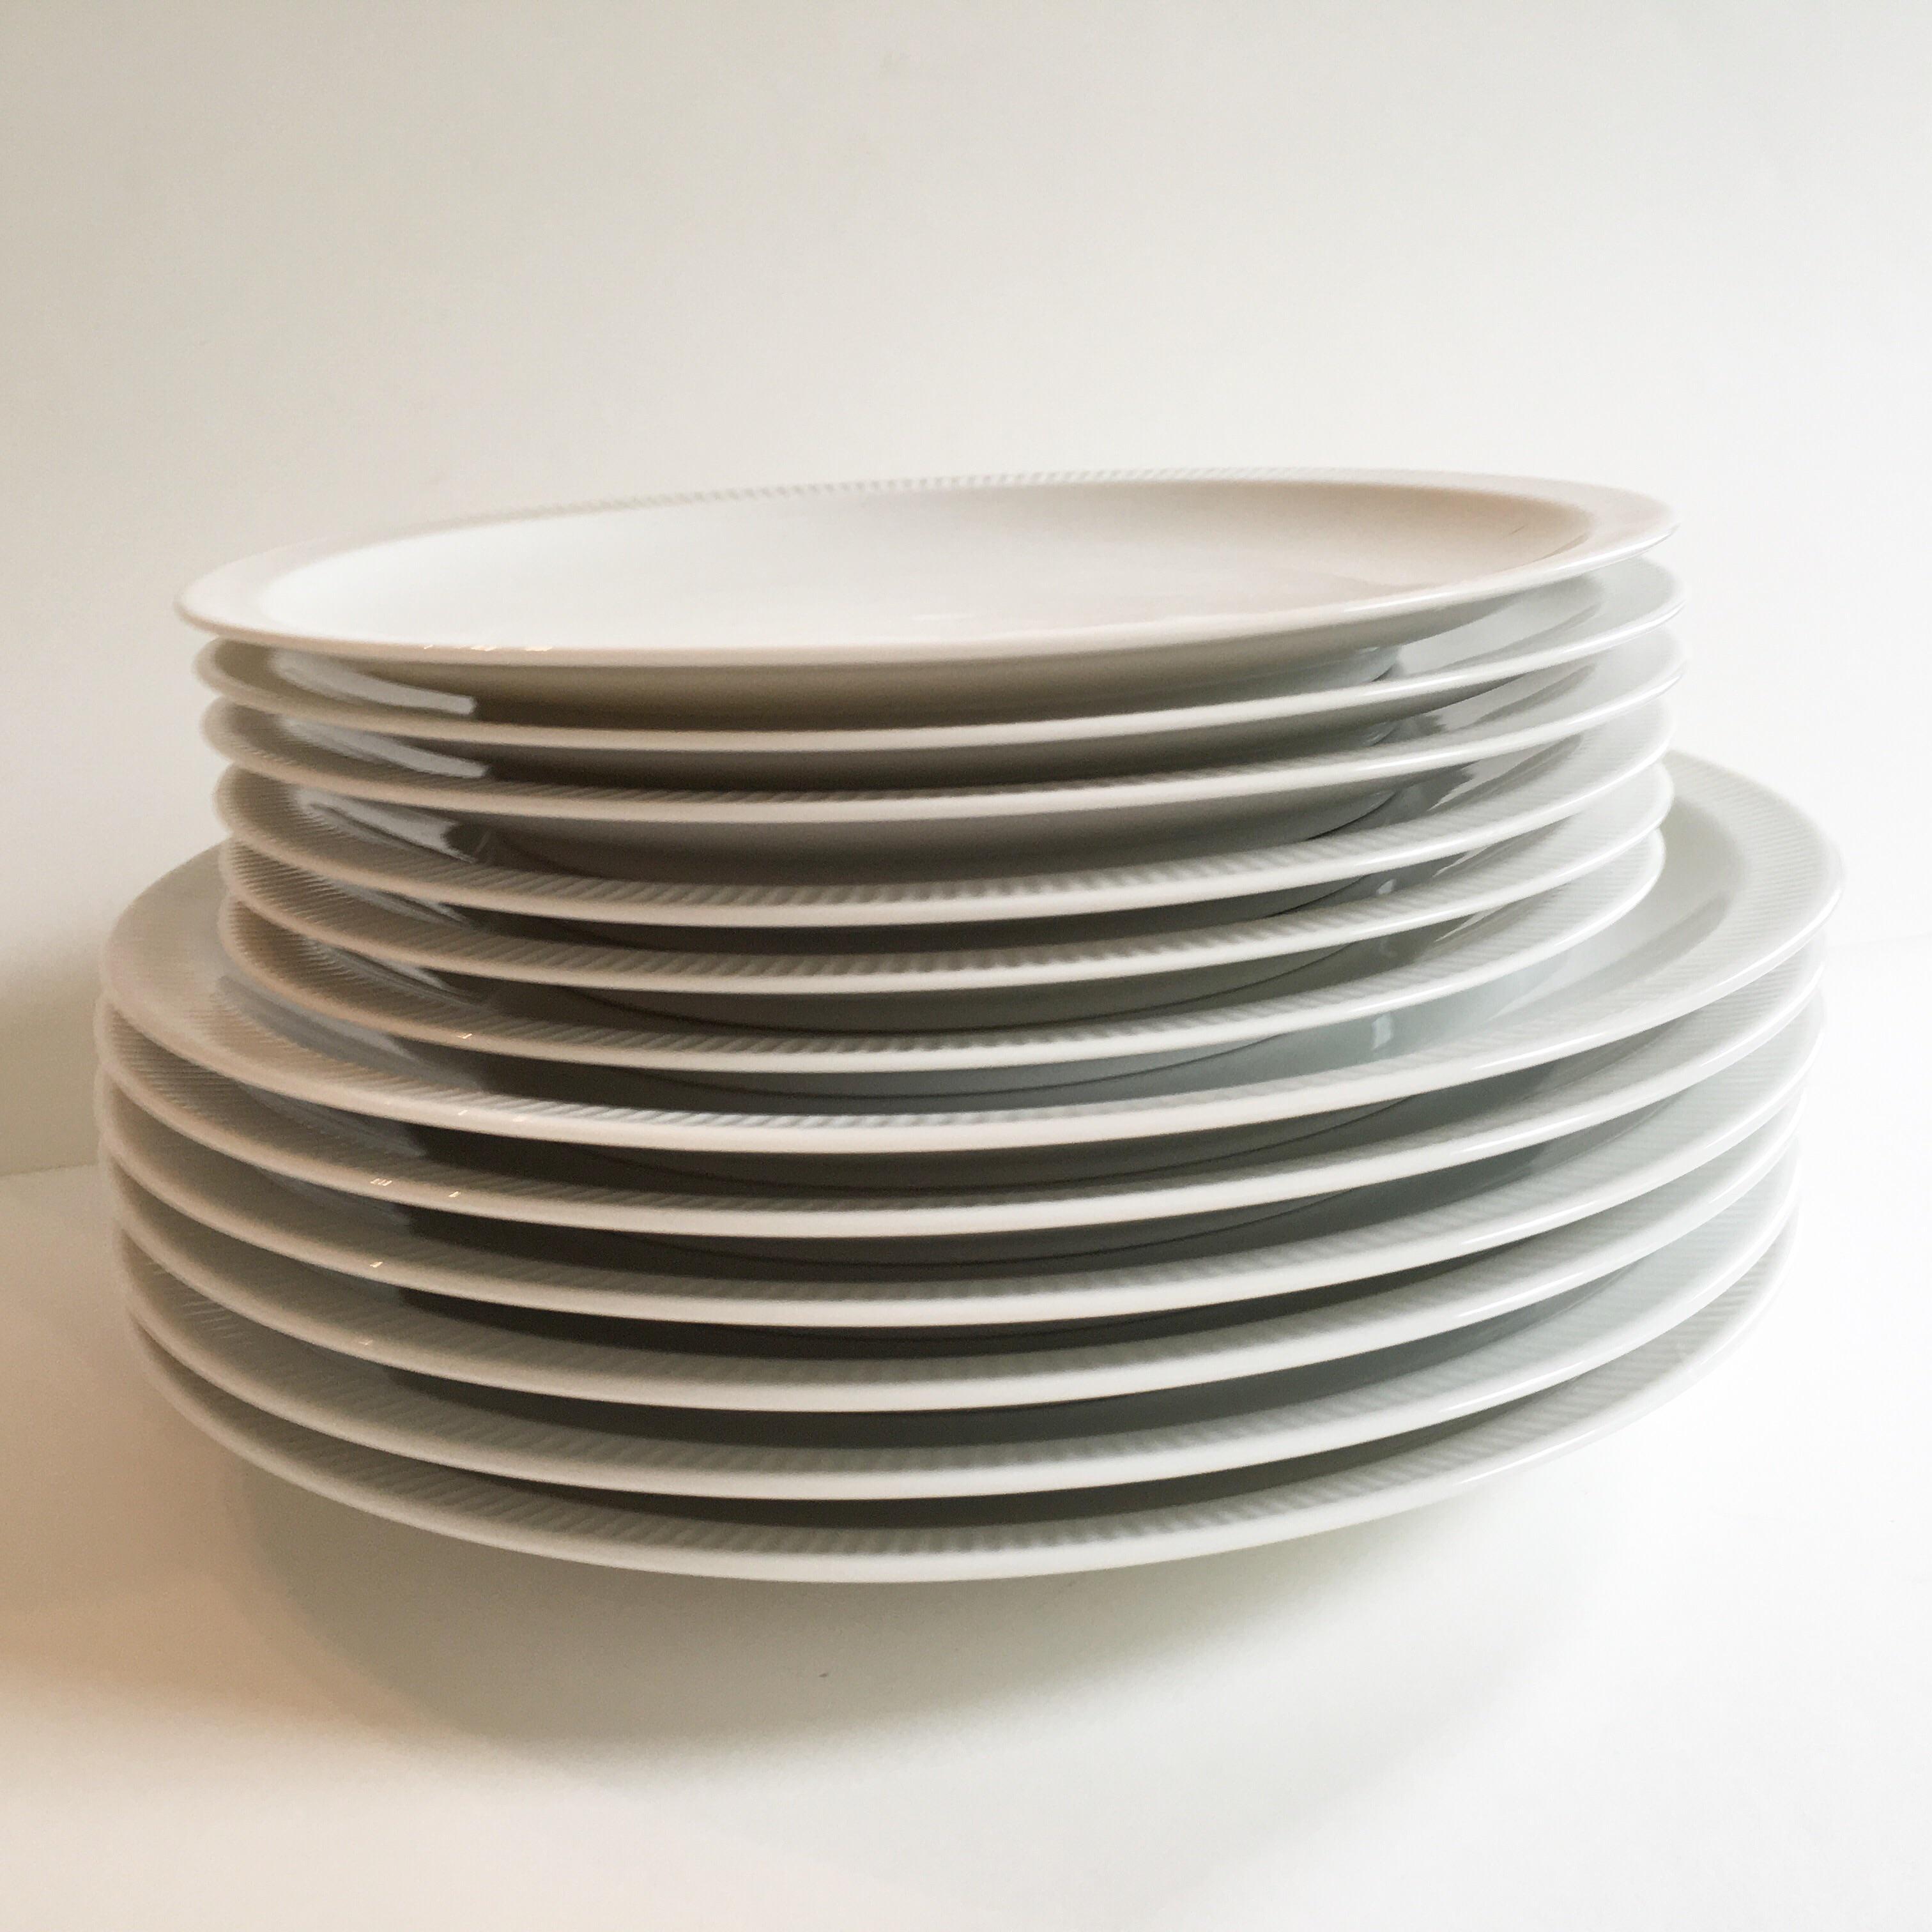 Mid-Century Arzberg \u0027Athena\u0027 Plates - Set of 12 - Image ... & Mid-Century Arzberg \u0027Athena\u0027 Plates - Set of 12 | Chairish